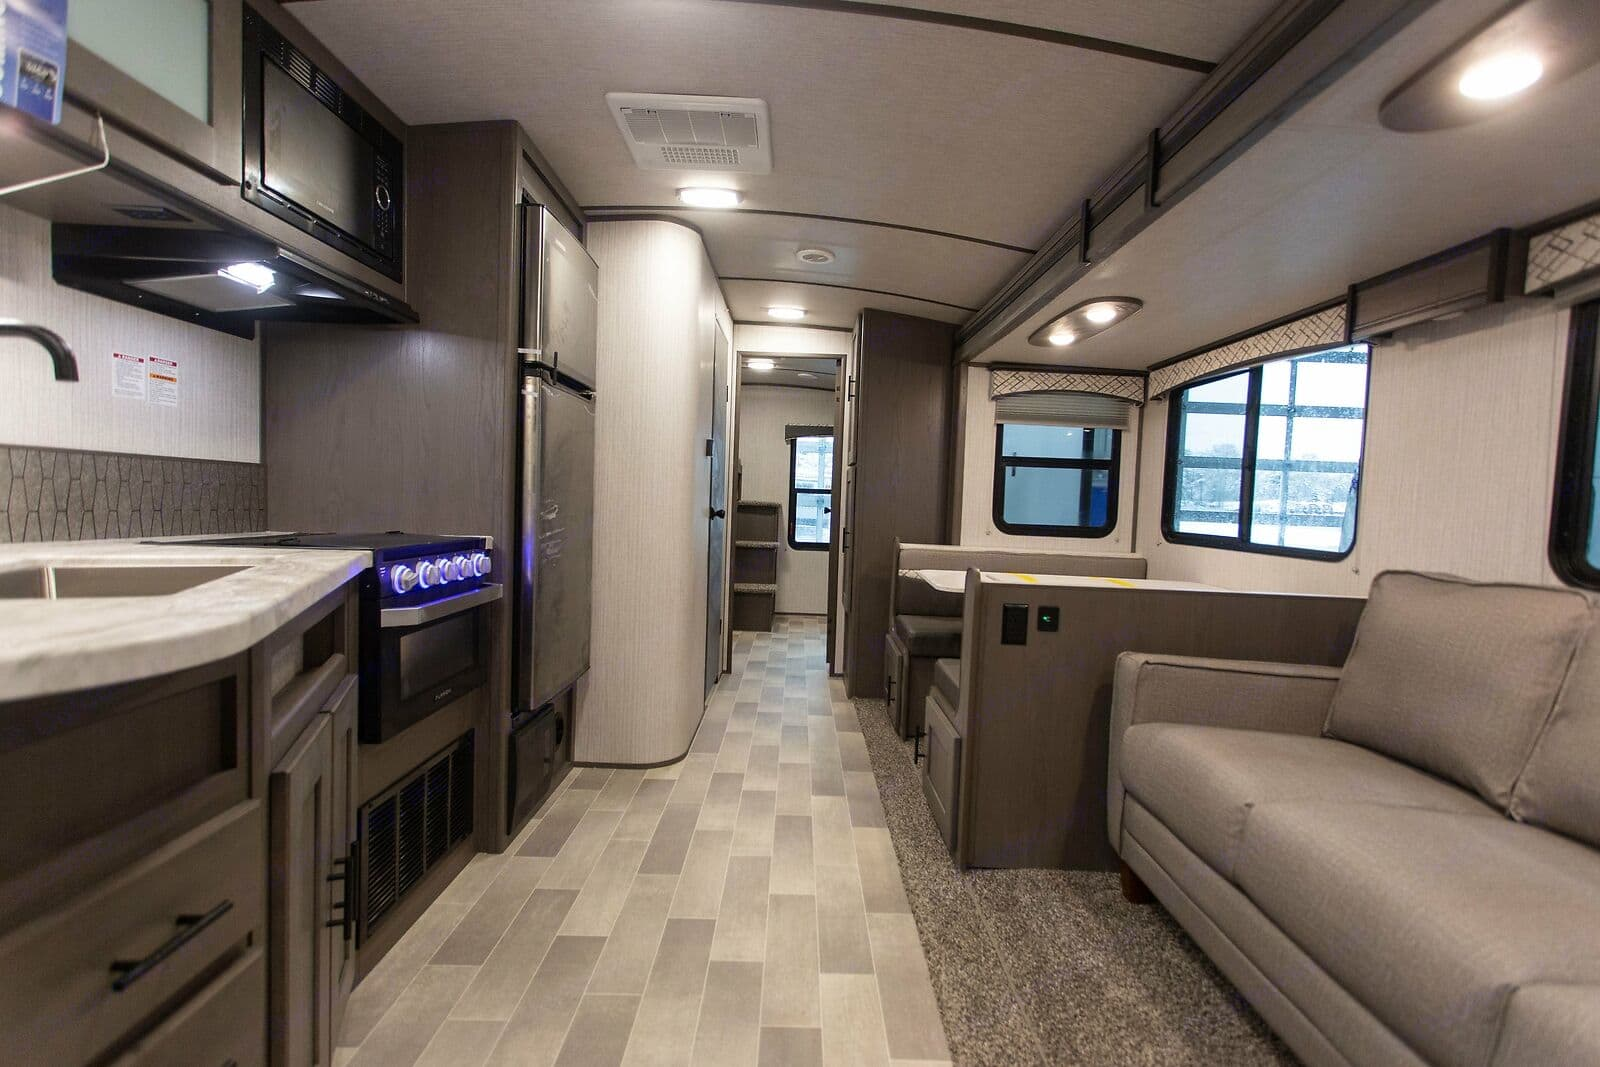 Cruiser Rv Corp Other 2020